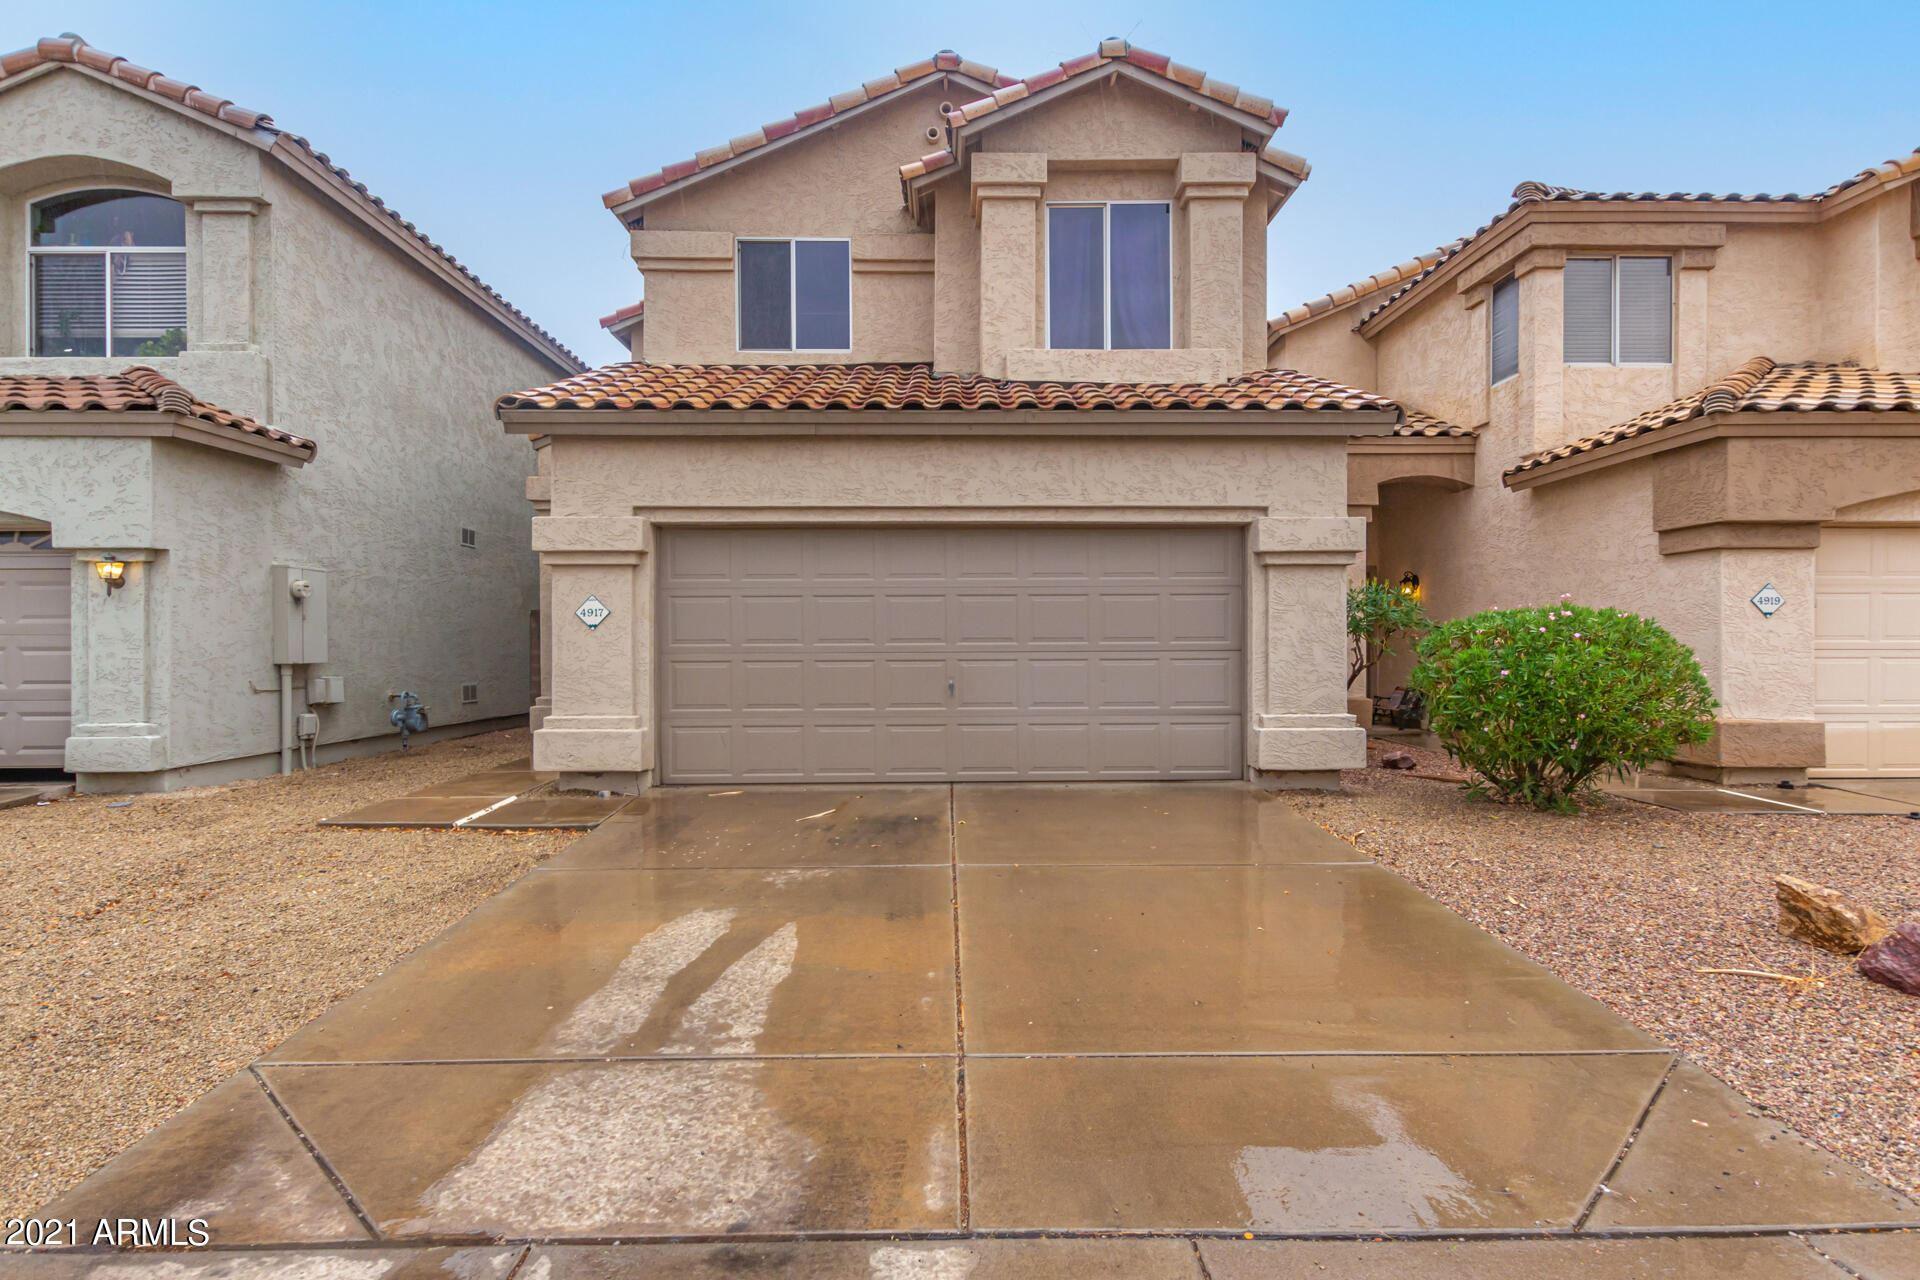 Photo of 4917 W BEHREND Drive, Glendale, AZ 85308 (MLS # 6269379)